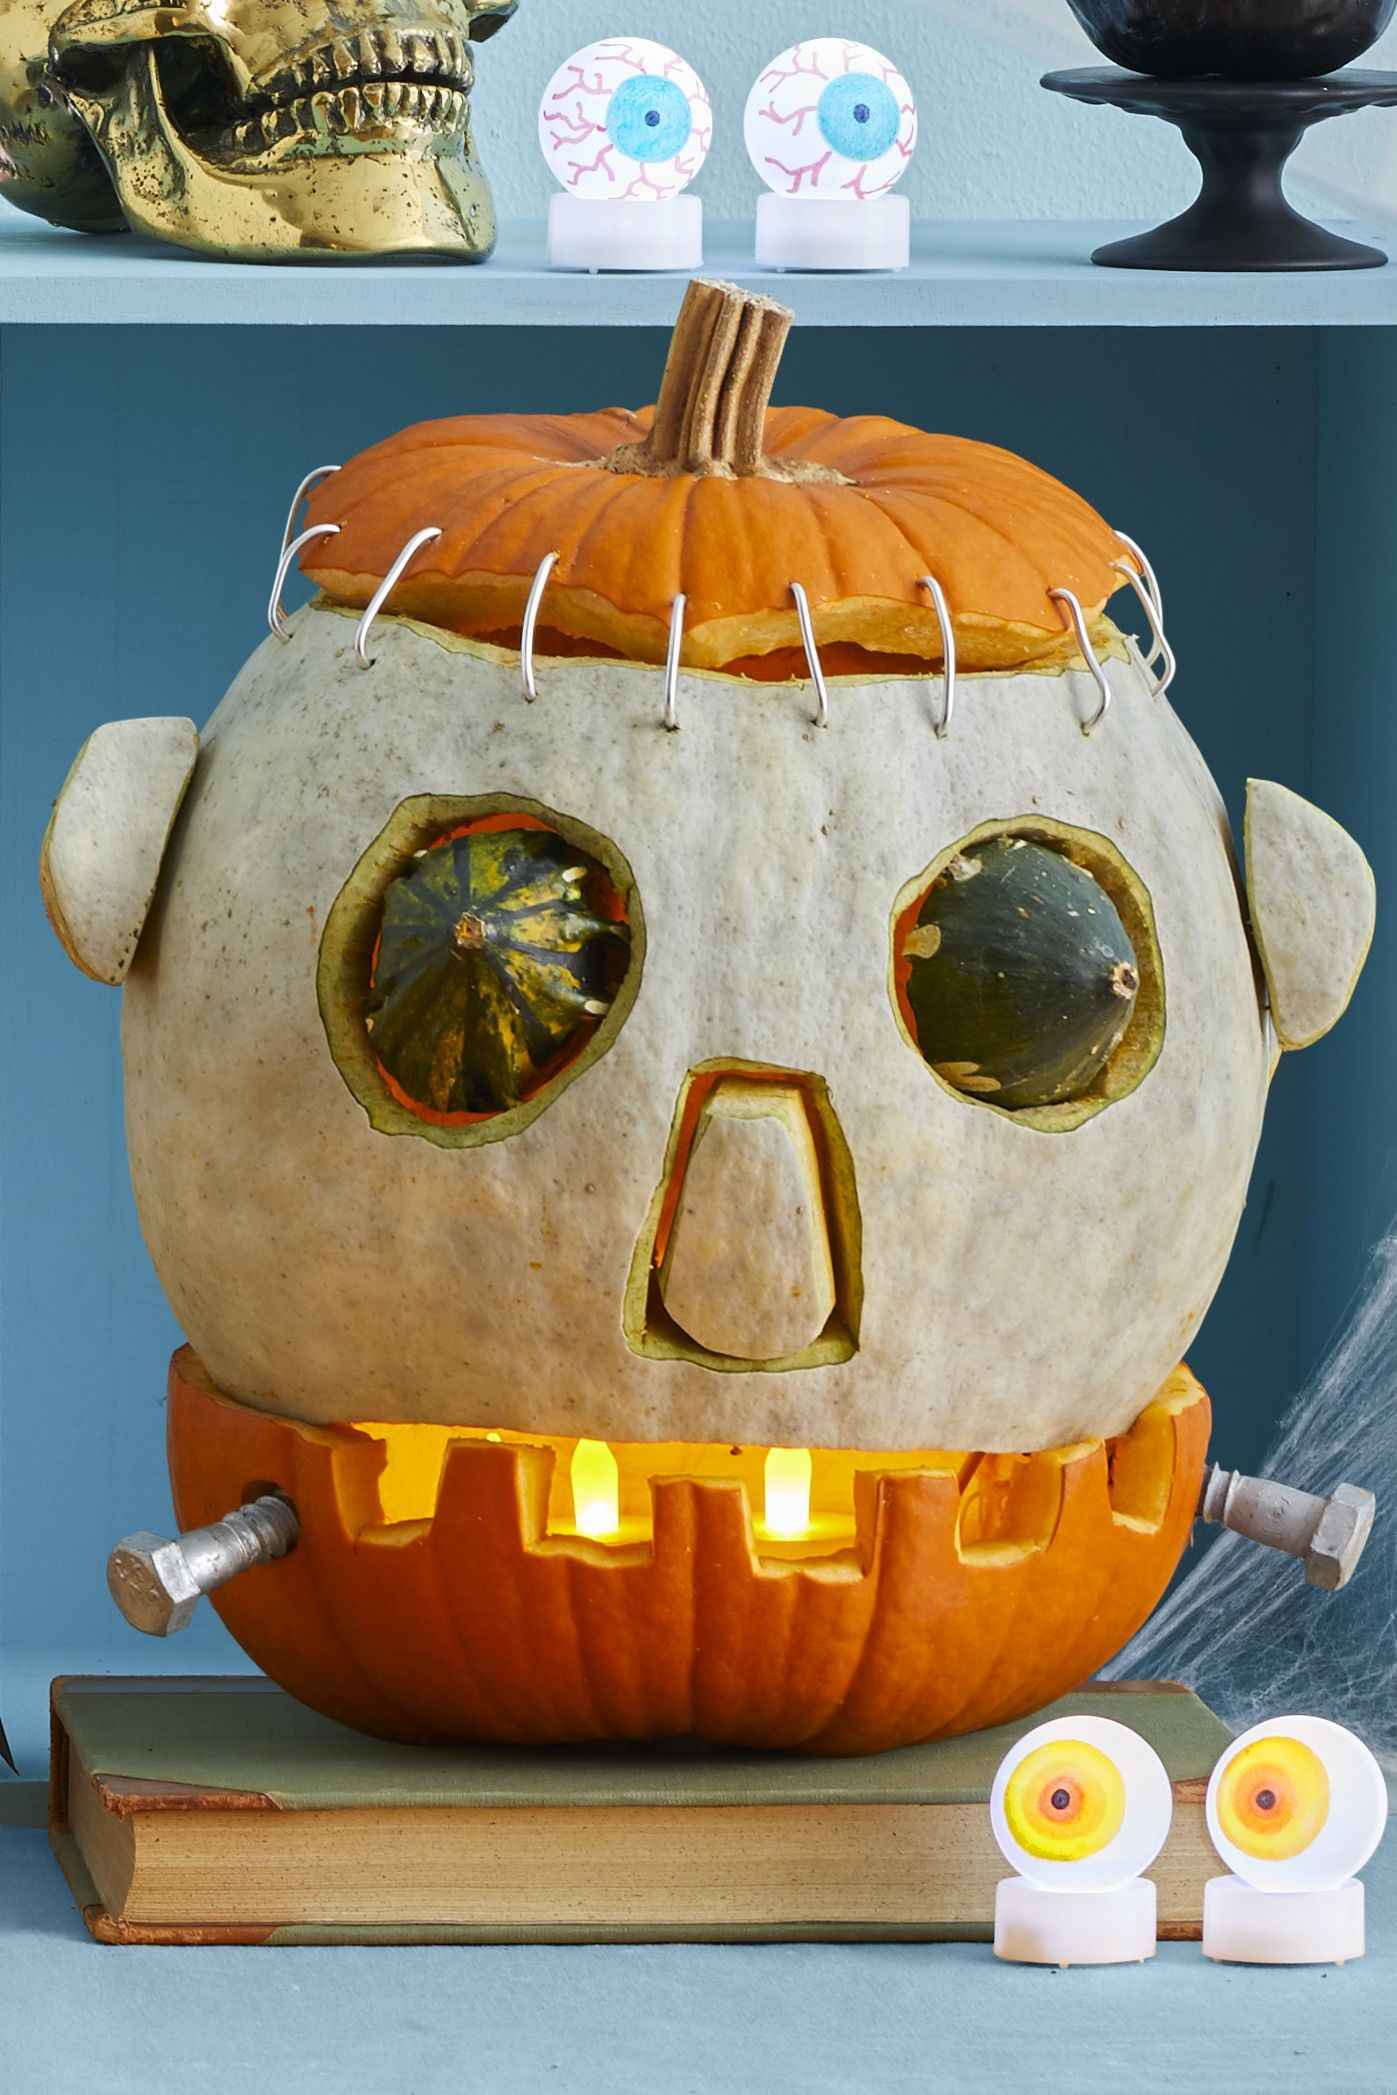 69 Pumpkin Carving Ideas For Halloween 2020 Creative Jack O Lantern Designs